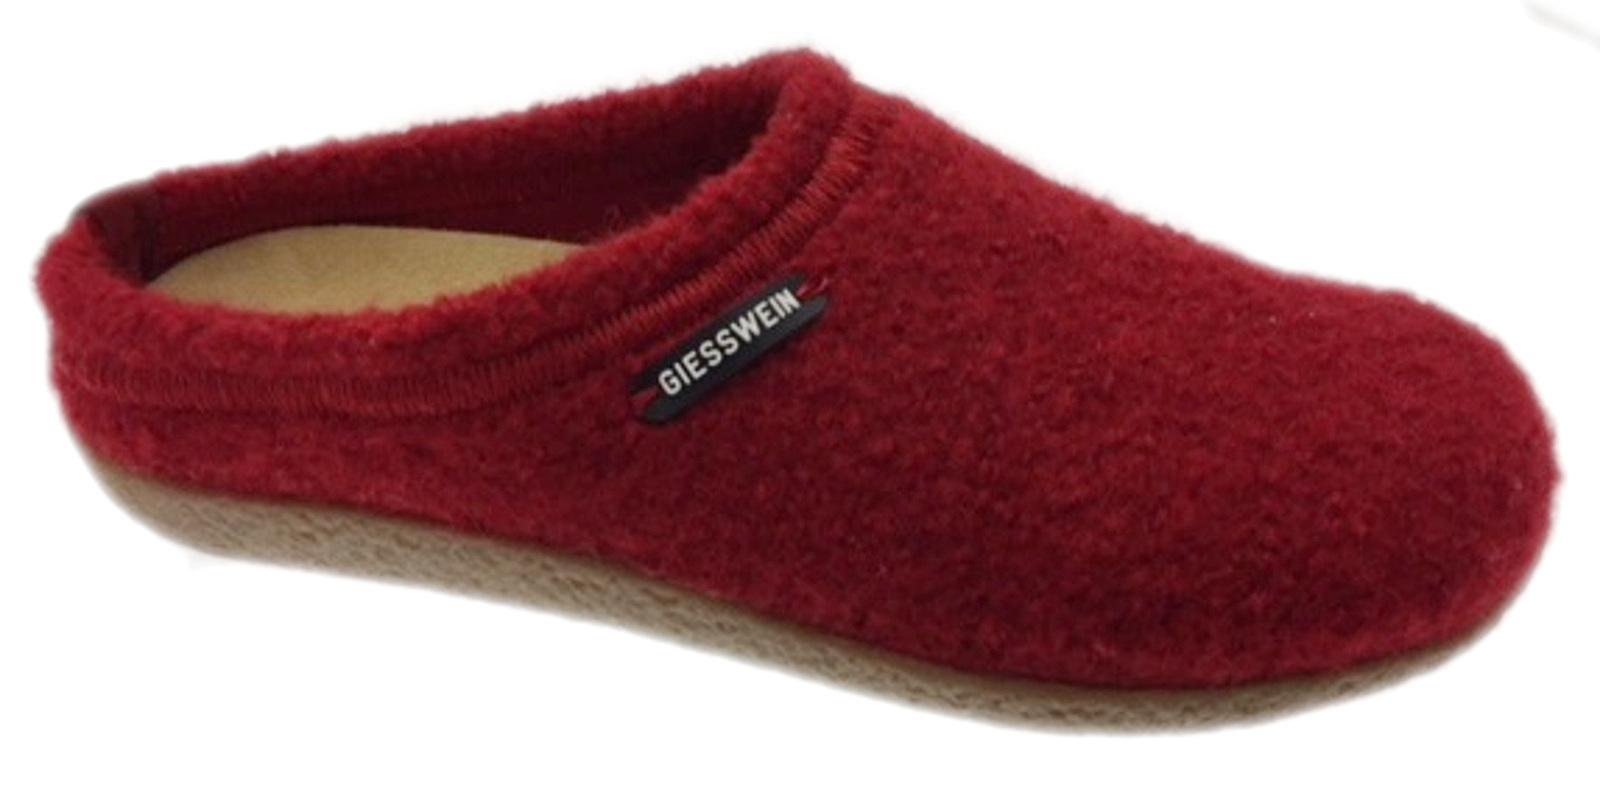 52 10 47848 342 Veitsch slipper unisex rode doek uitneembaar voetbed Giesswein